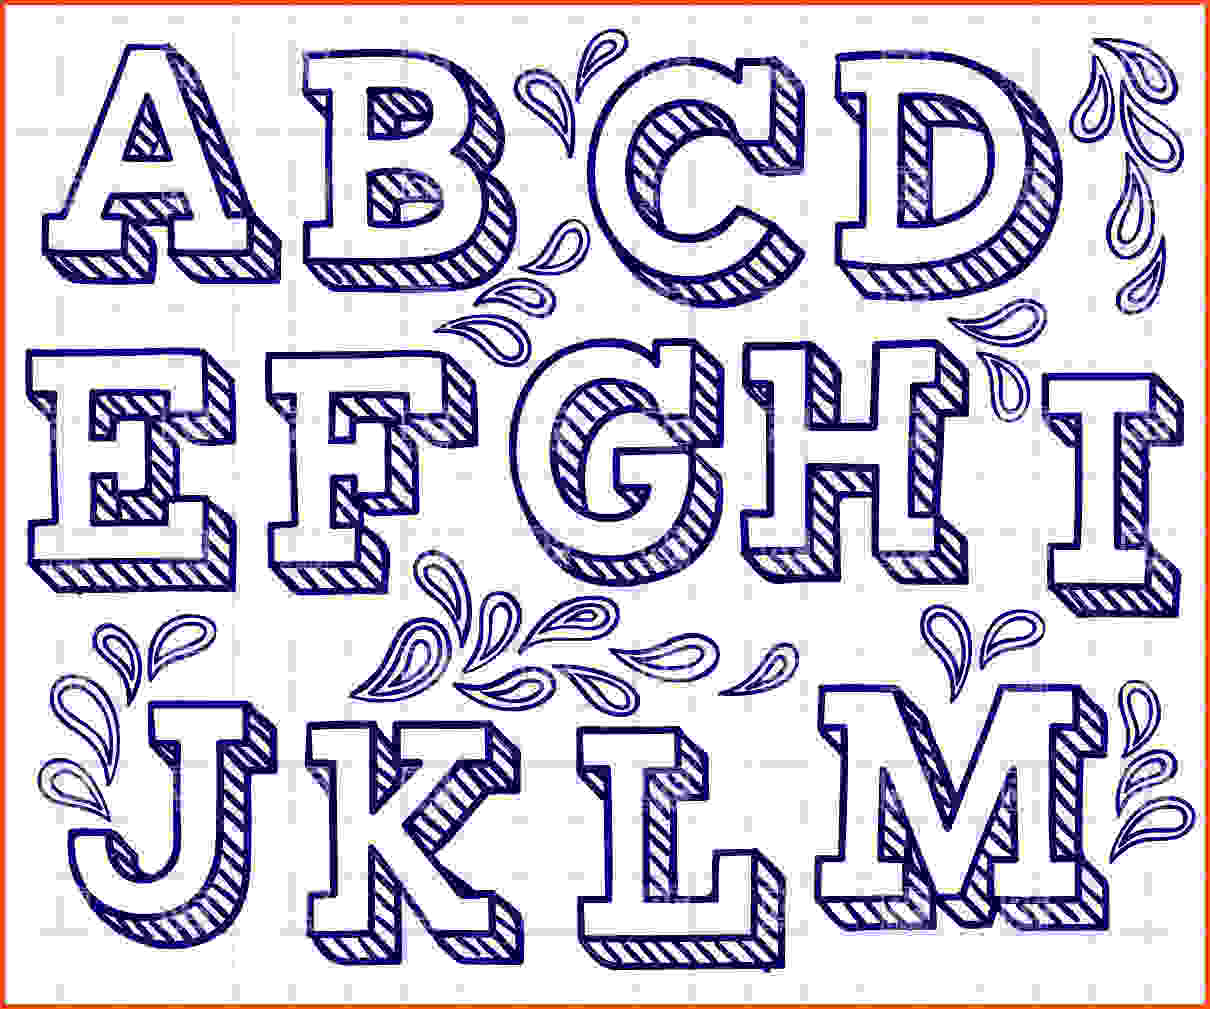 1210x1009 Cool Fonts Bubble Letters Lettershand Drawn Font